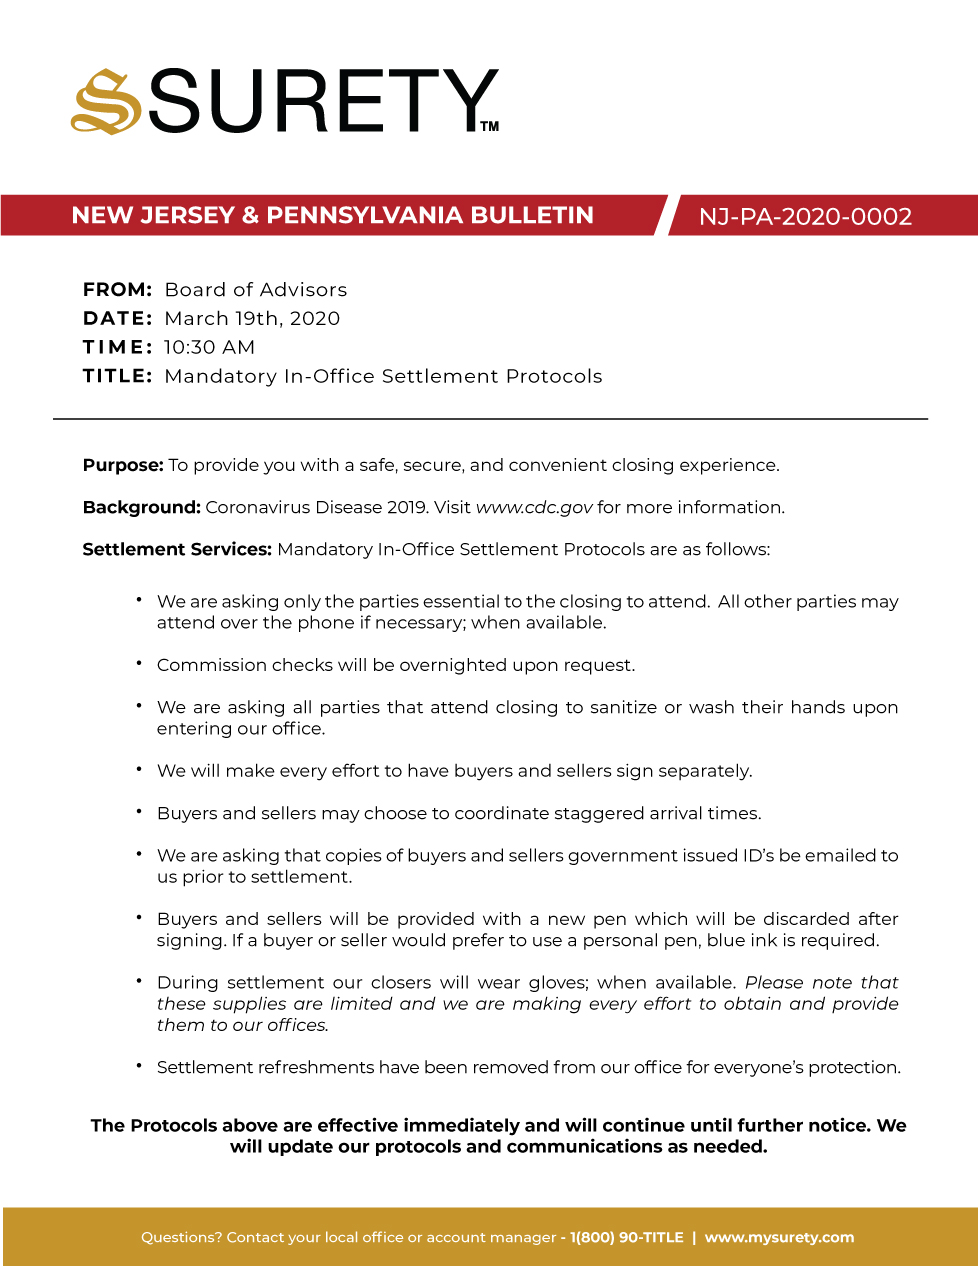 NJPA-Bulletin-3.19-Surety